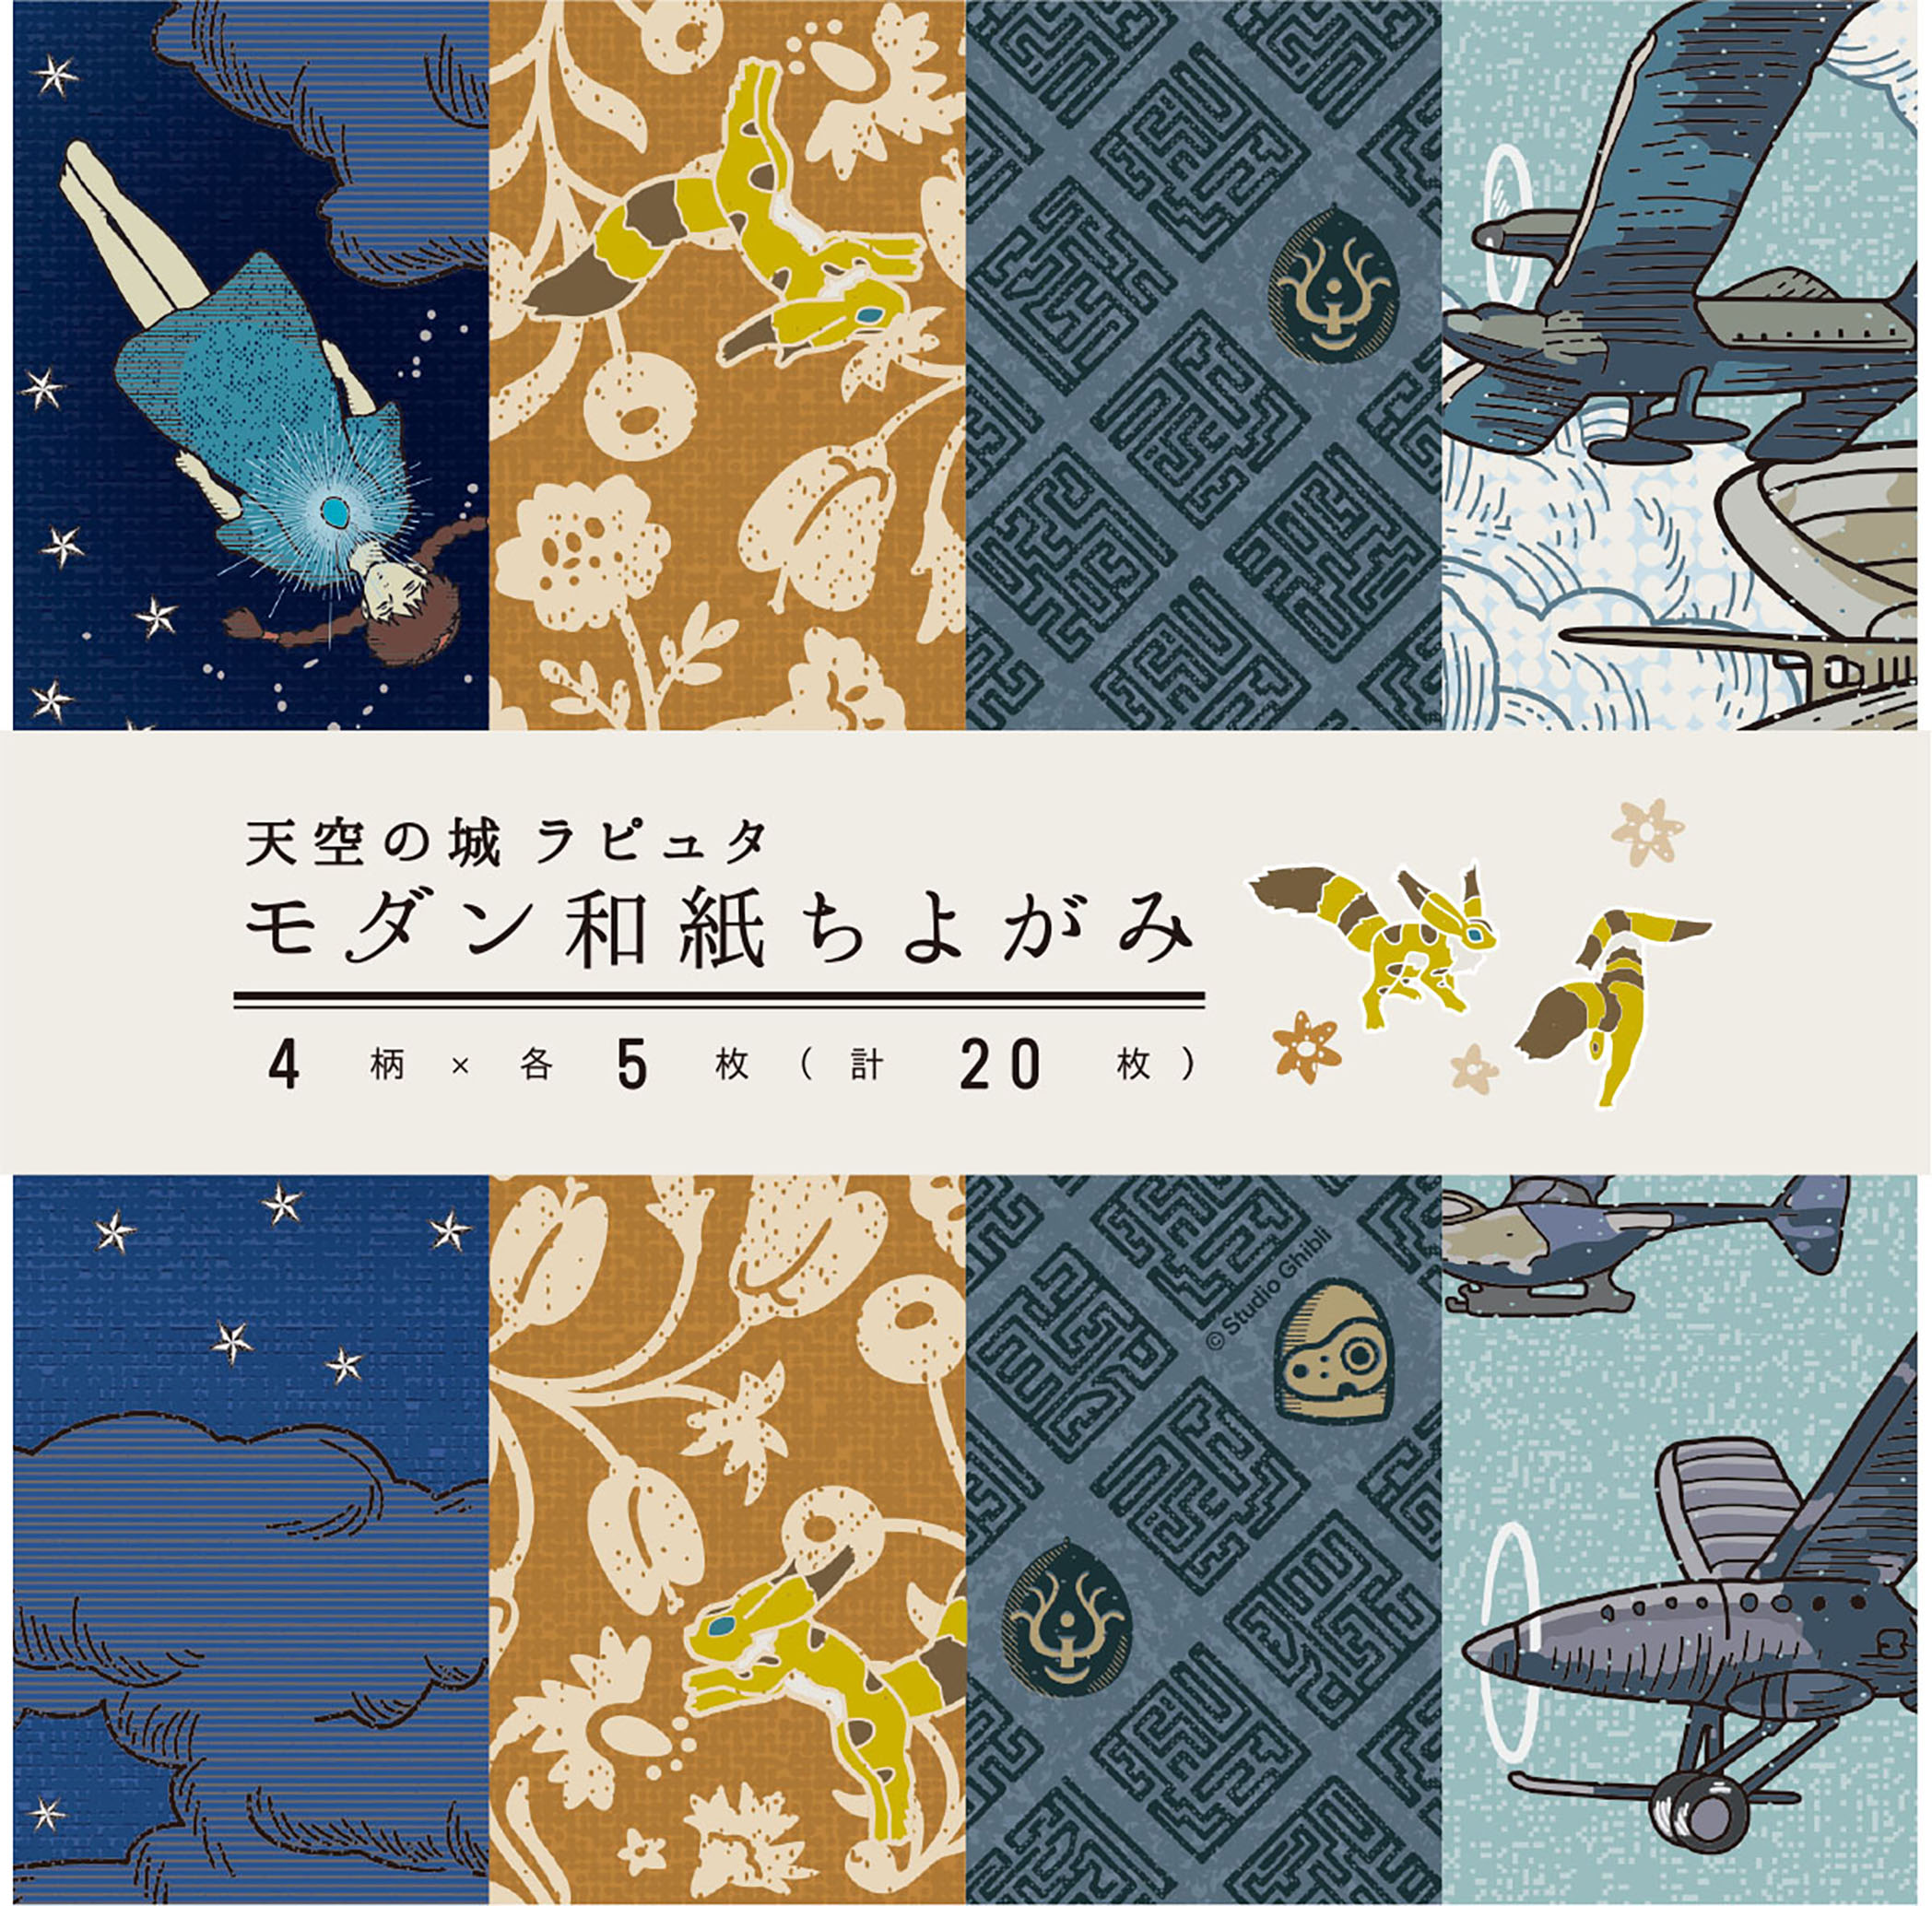 "Ensky Castle in the Sky Chiyomi Paper ""Castle in the Sky"" Origami Paper"